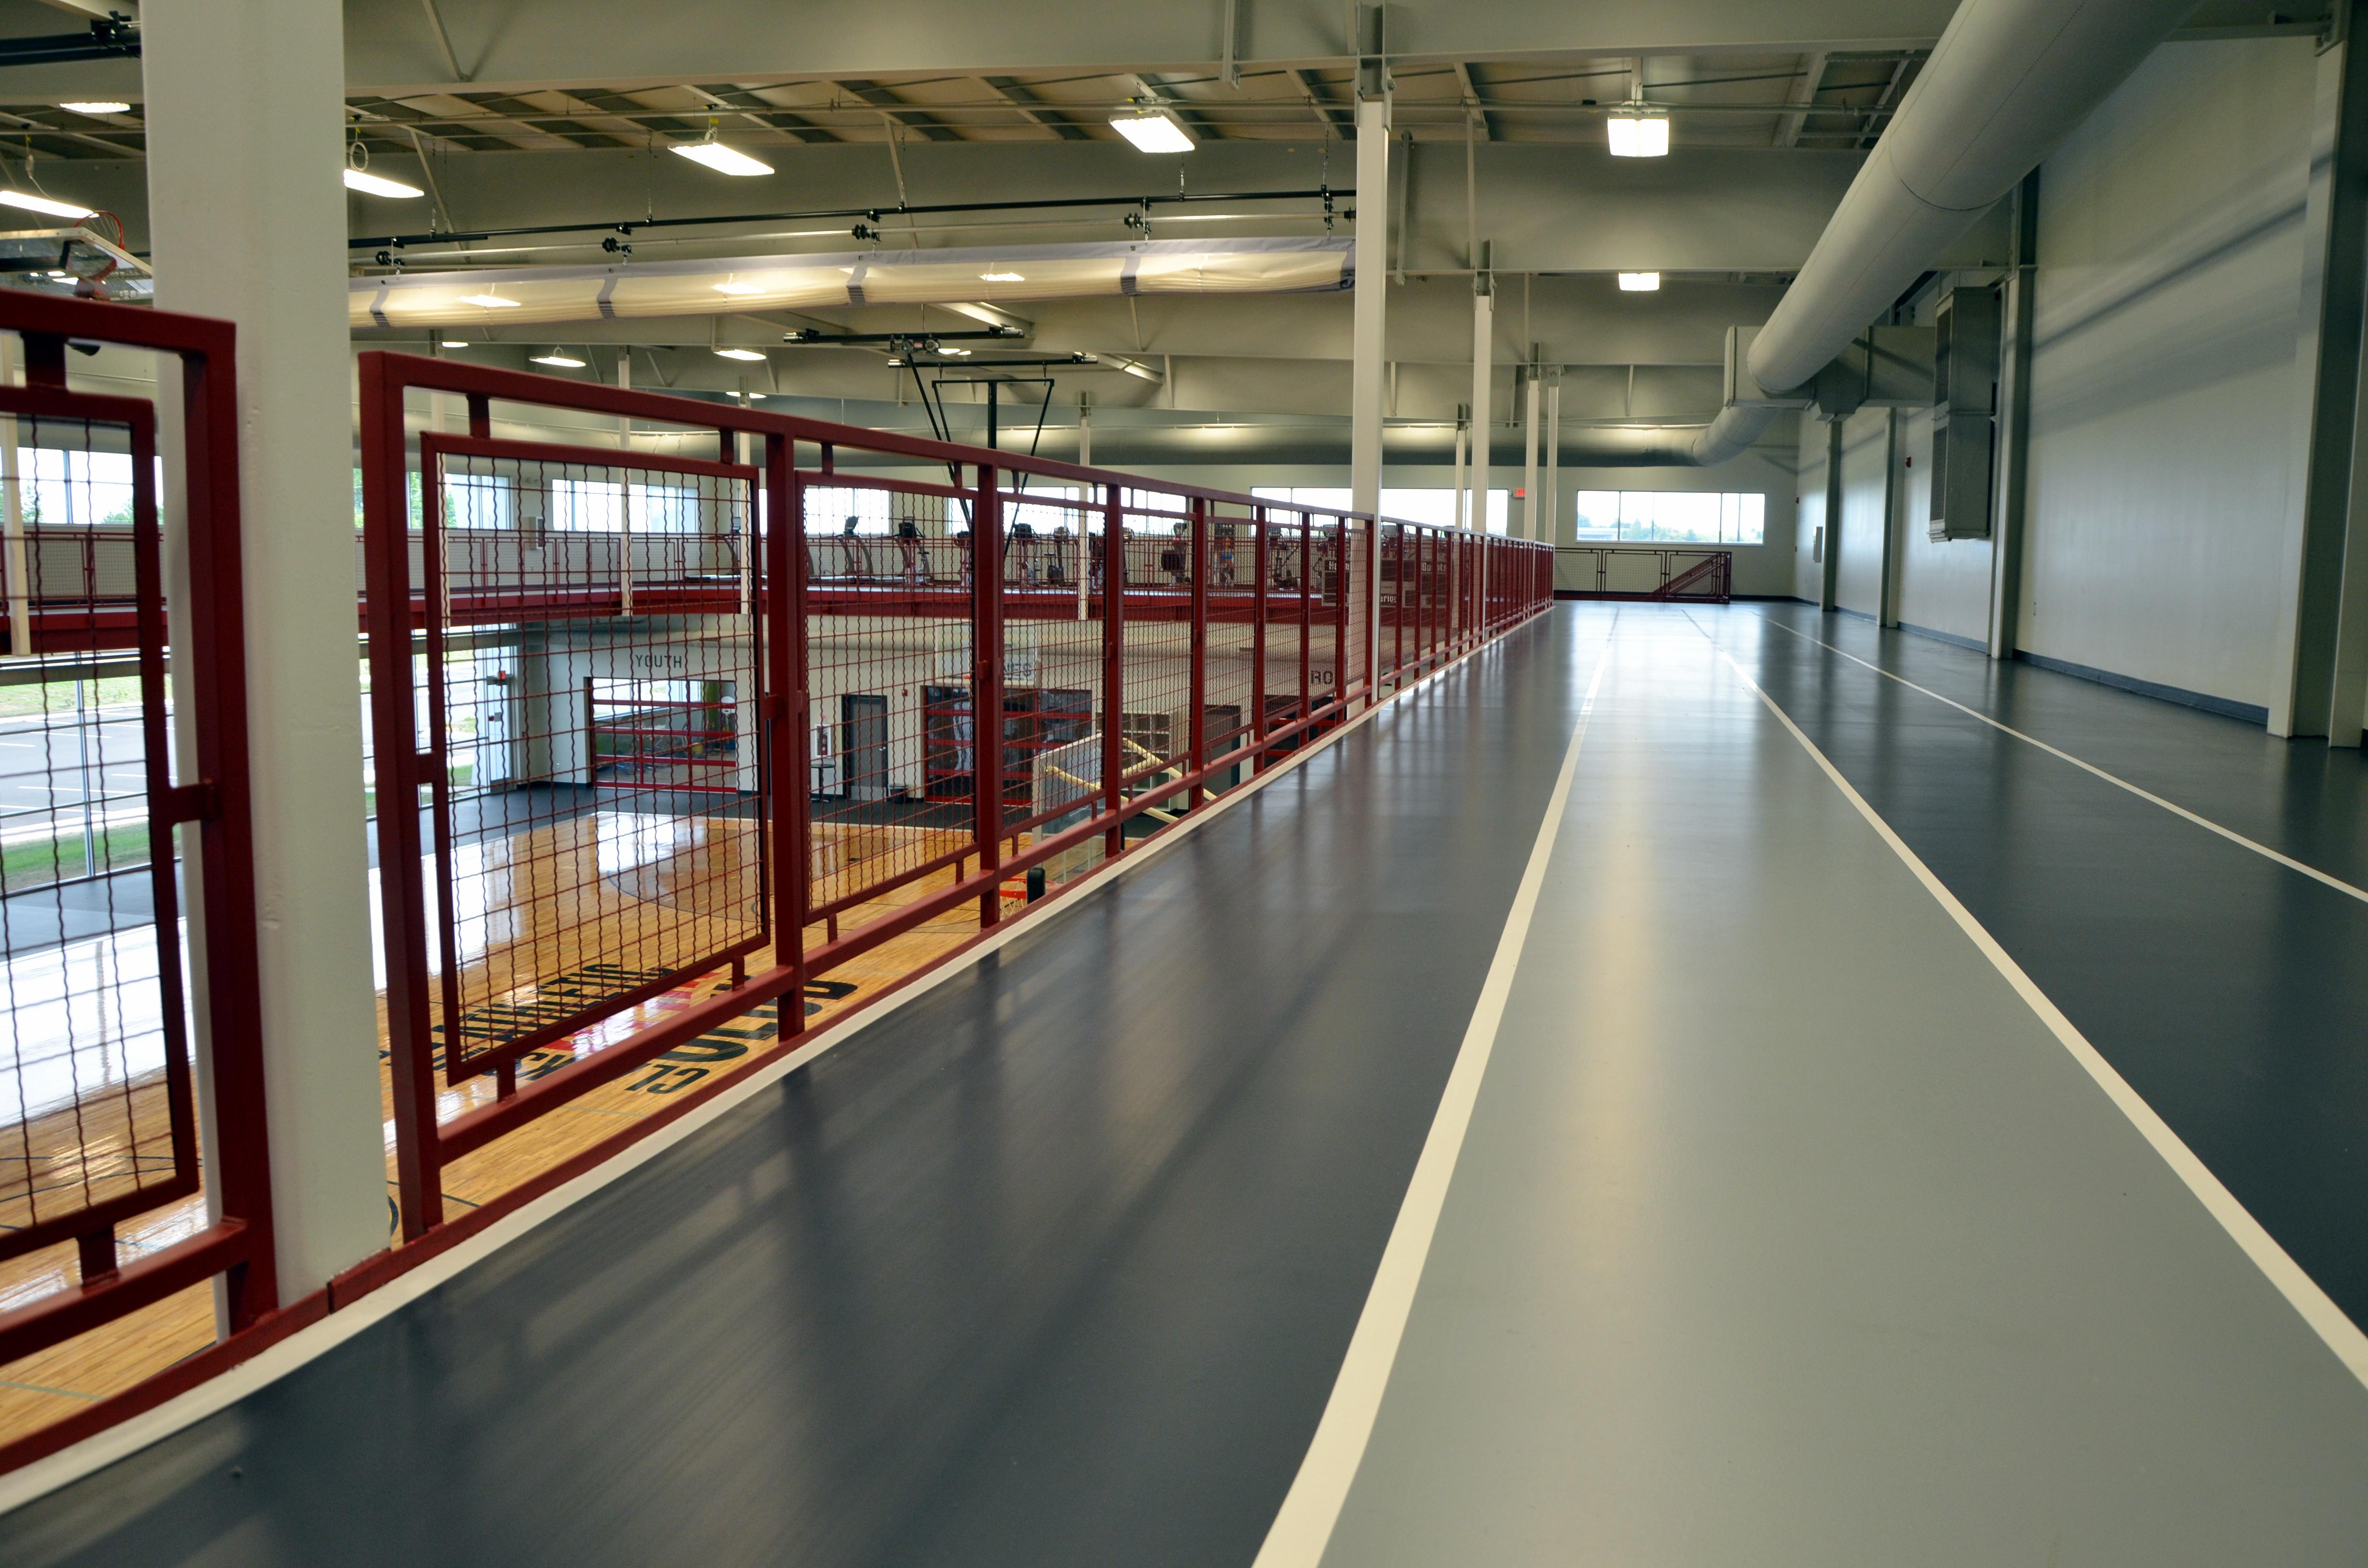 Synthetic floor installations epoxy flooring for schools for Clarksville flooring